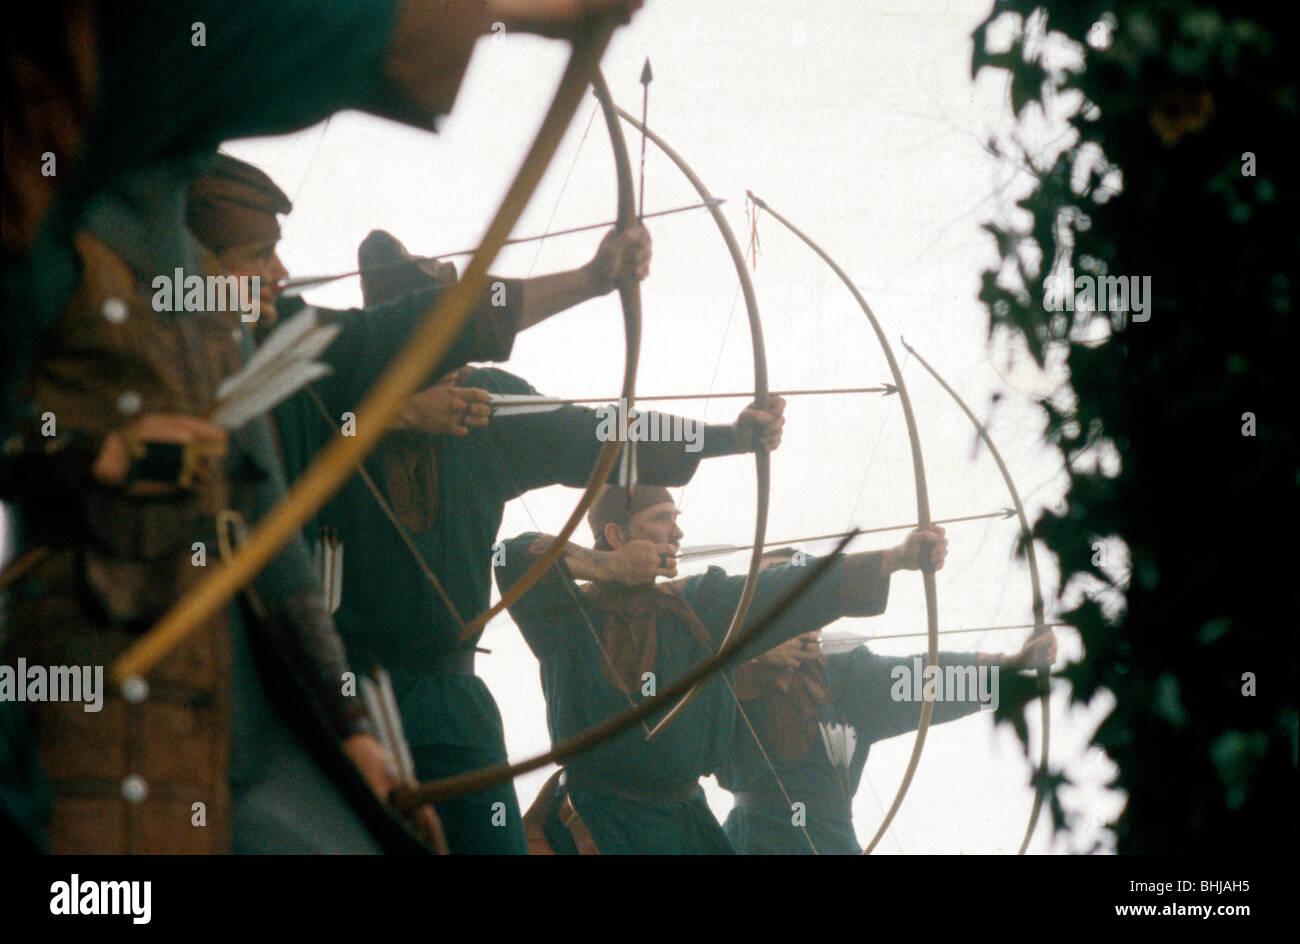 Archers in a battle re-enactment. Artist: Geoffrey Davis - Stock Image